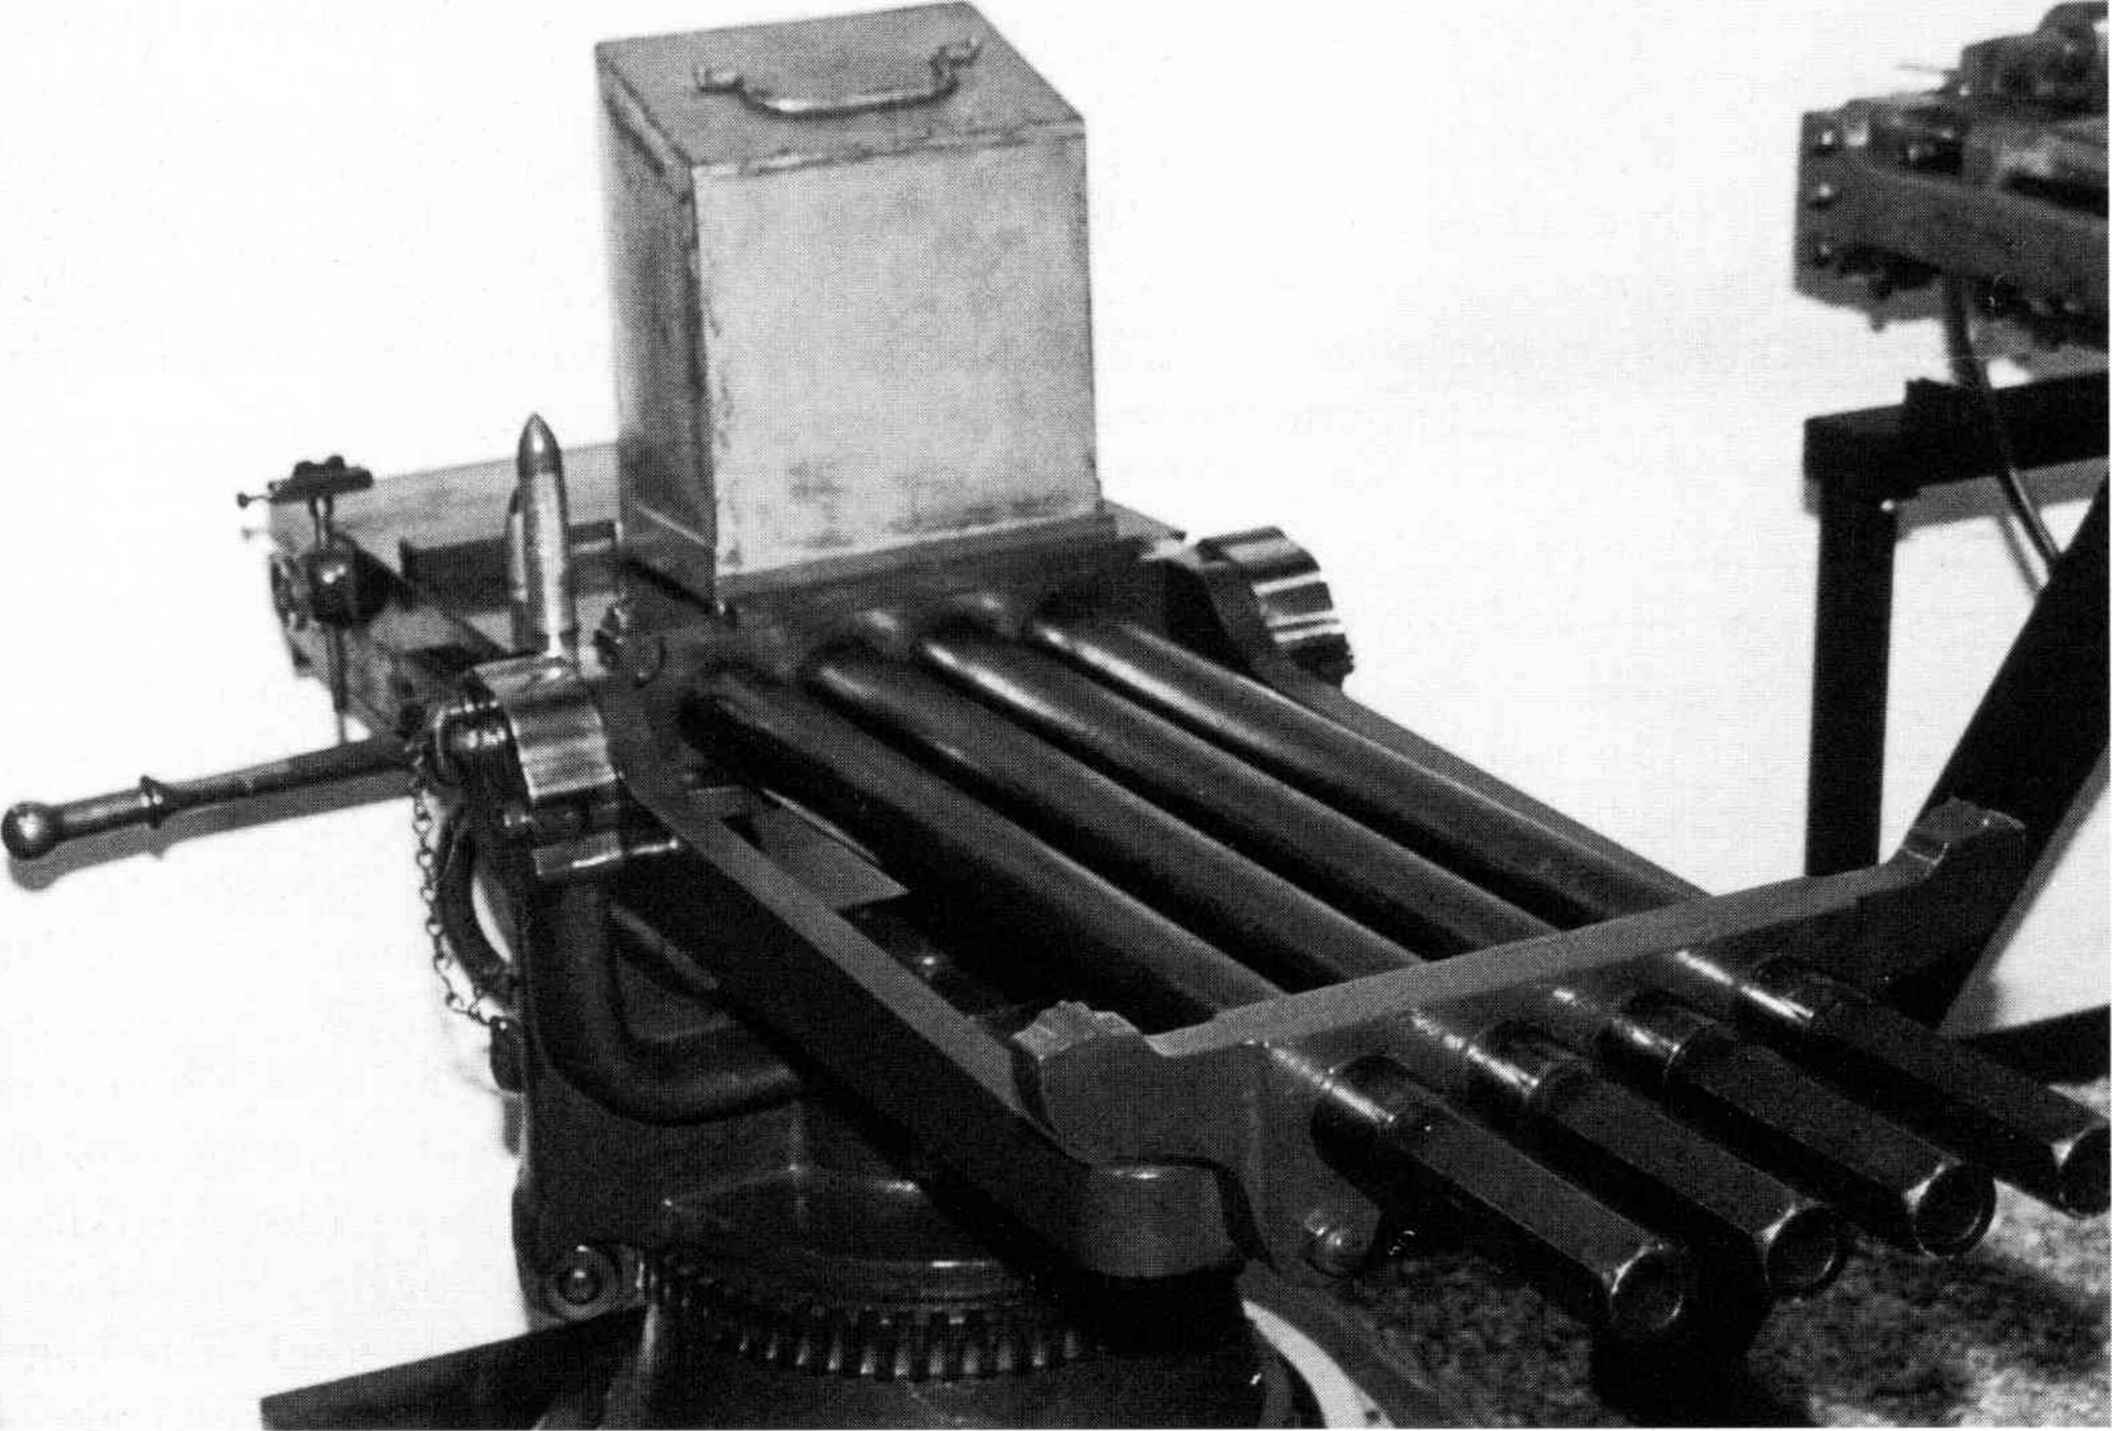 barrel machine gun